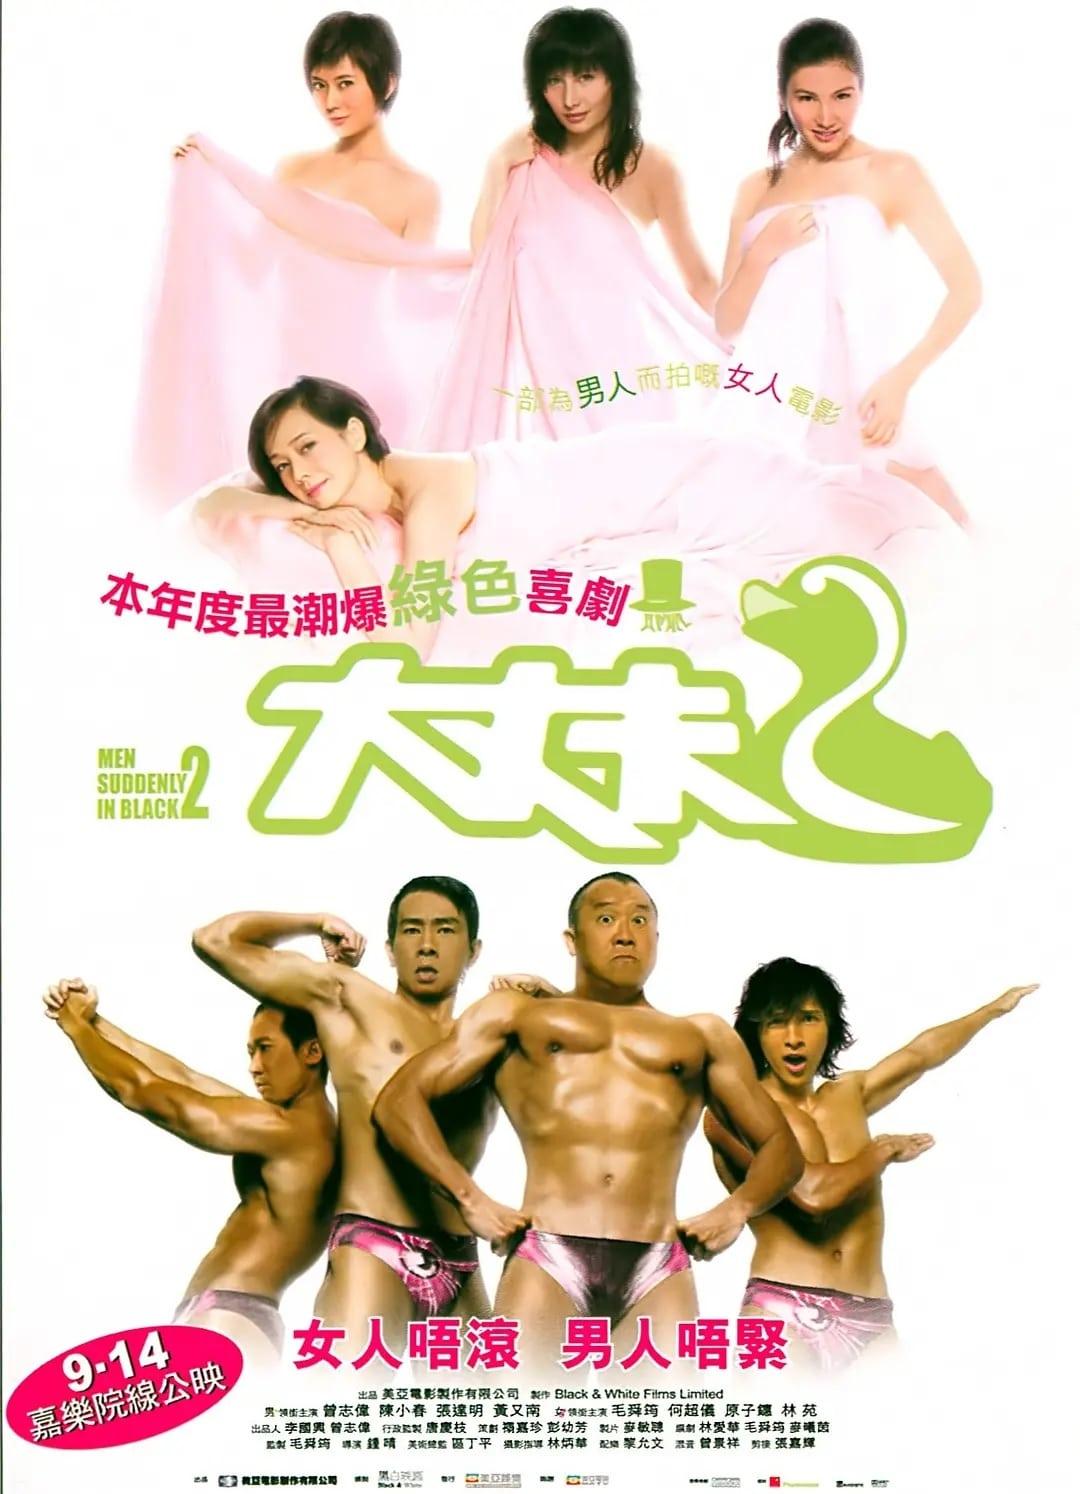 Men Suddenly in Black 2 (2006)